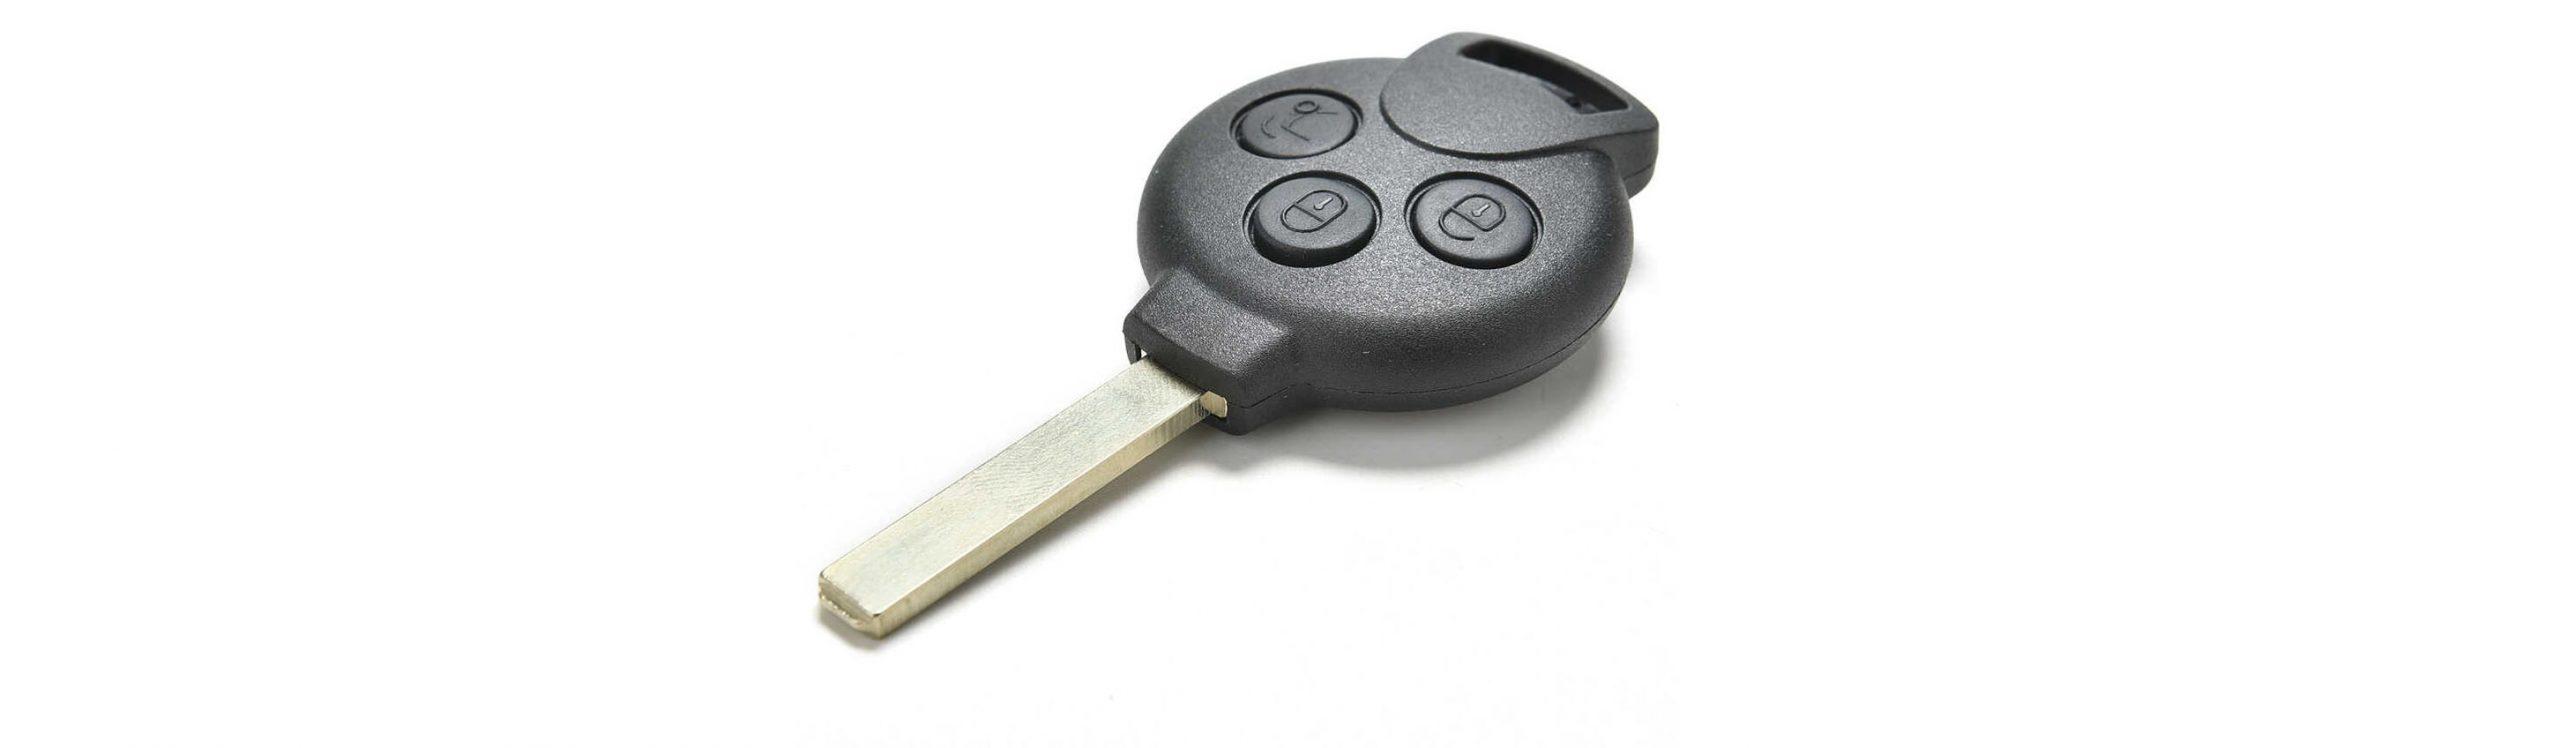 smart fortwo 451 kulcs elemcsere milyen elem kell a smart kulcsba?